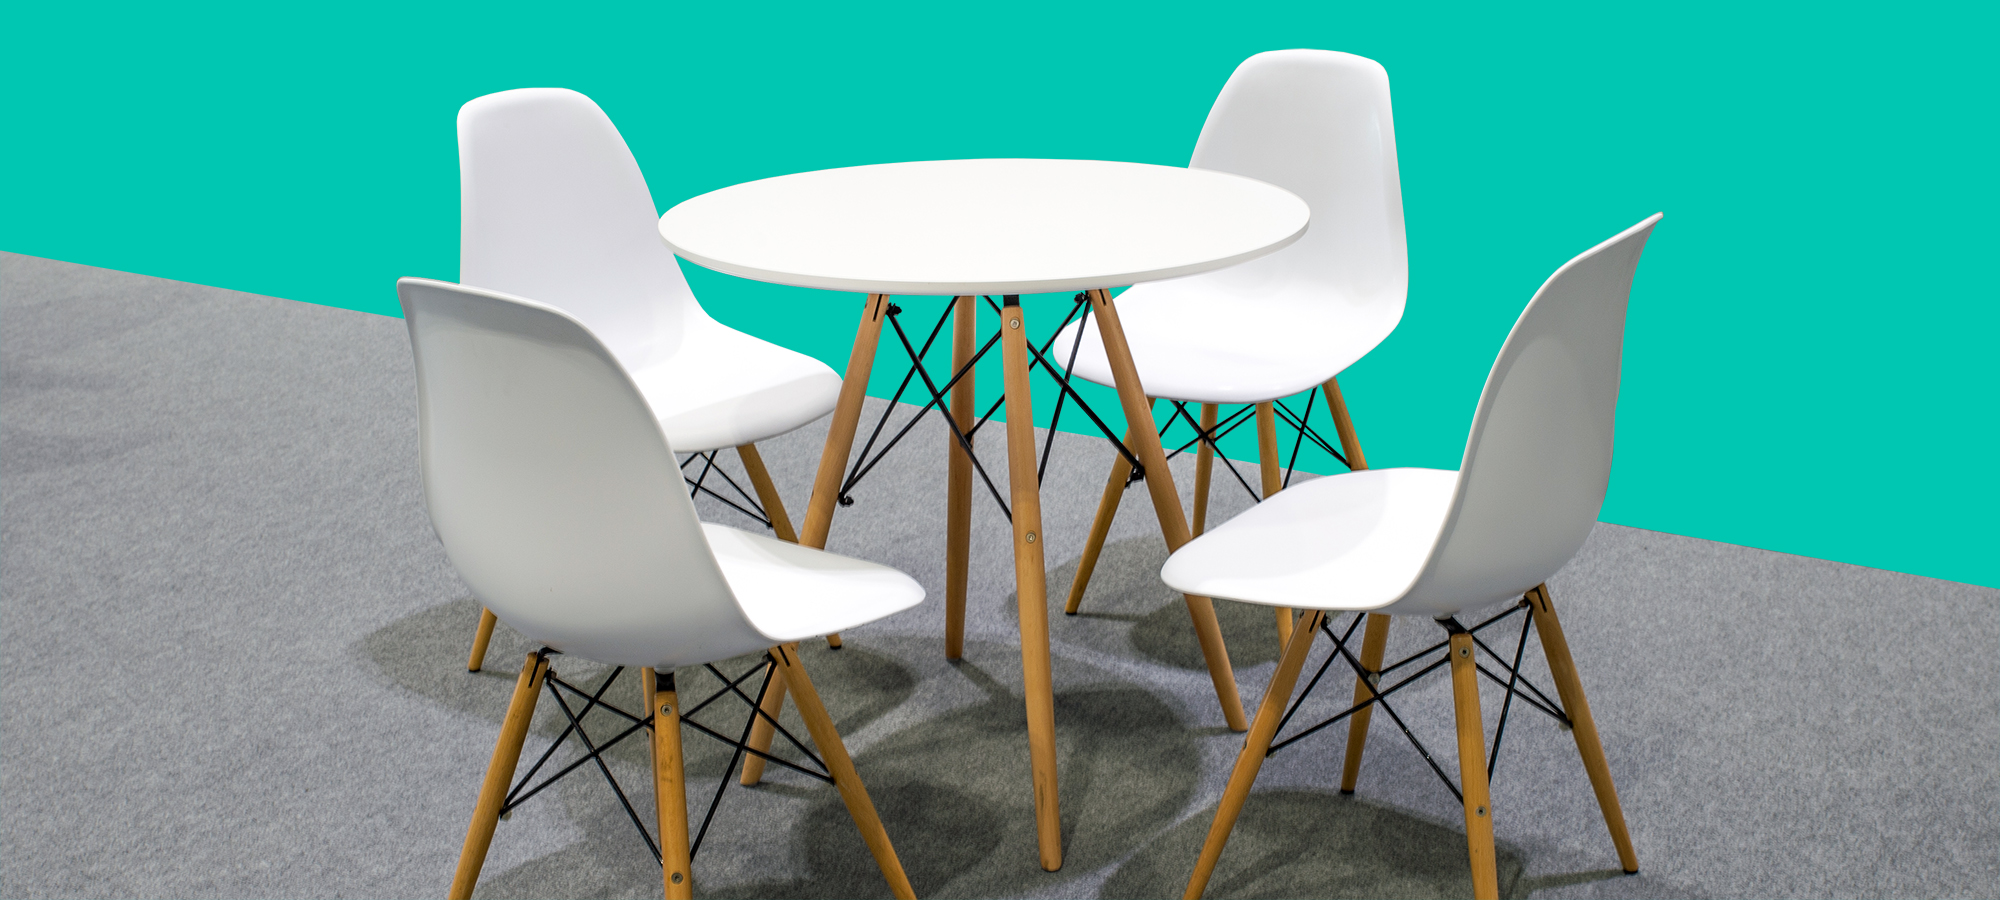 Furniture Design Exhibition London brilliant furniture design exhibition london on